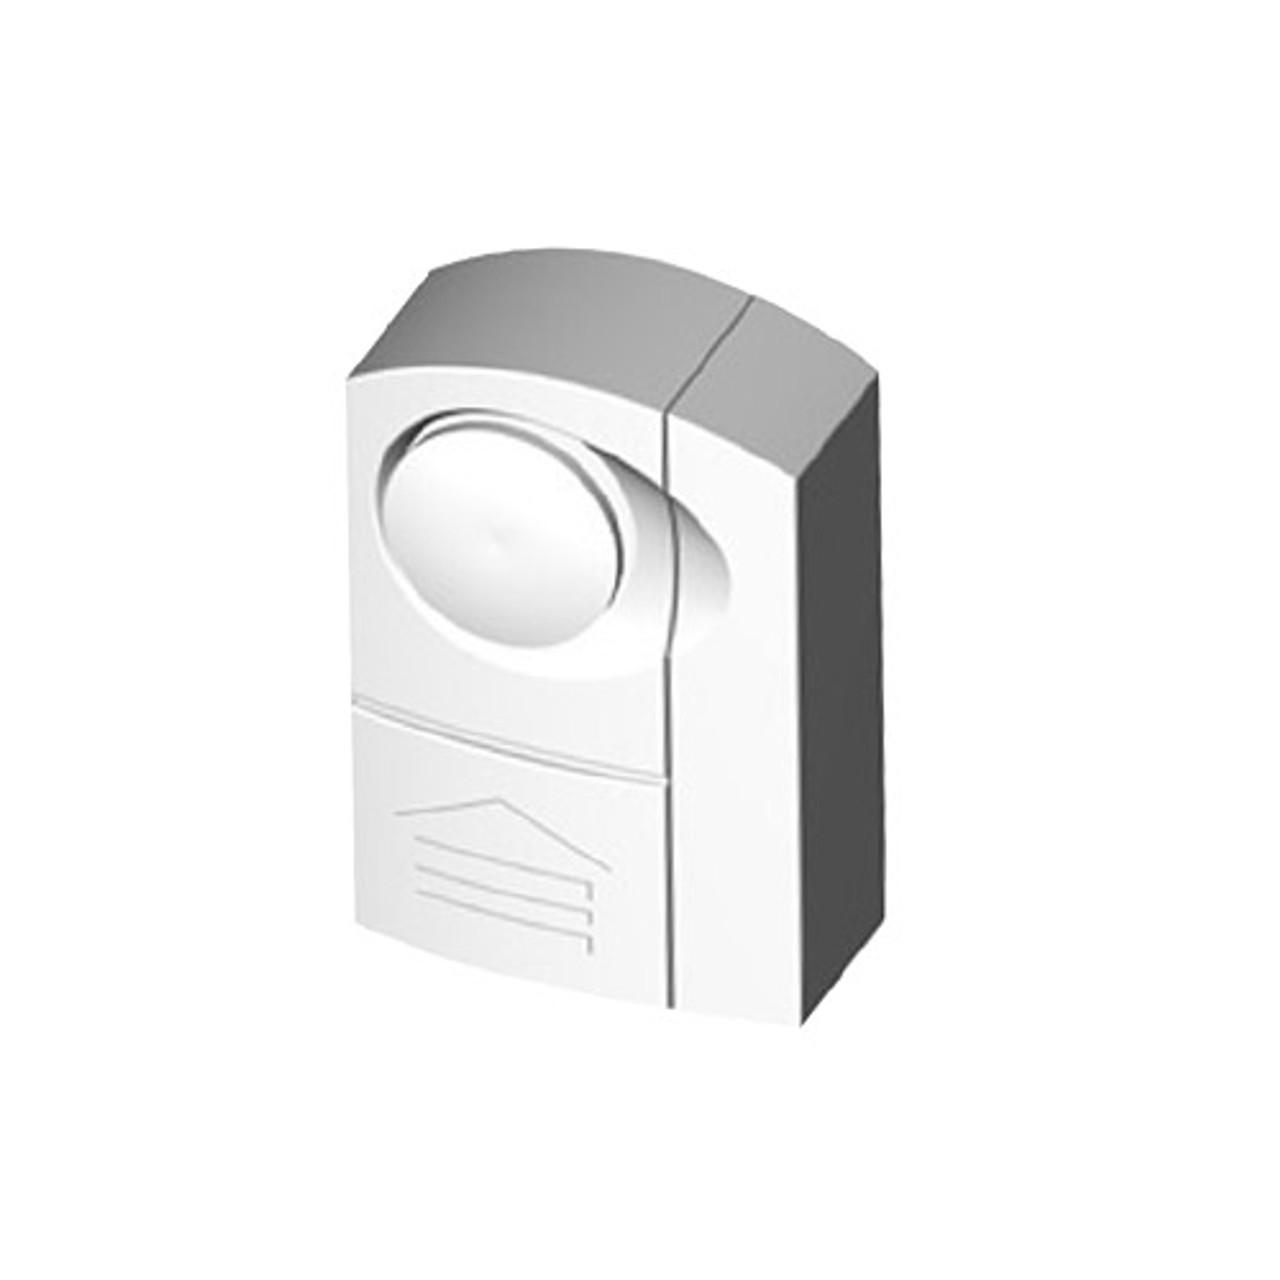 Trine-215 Trine Window or Door Entry/Exit Signal Kit